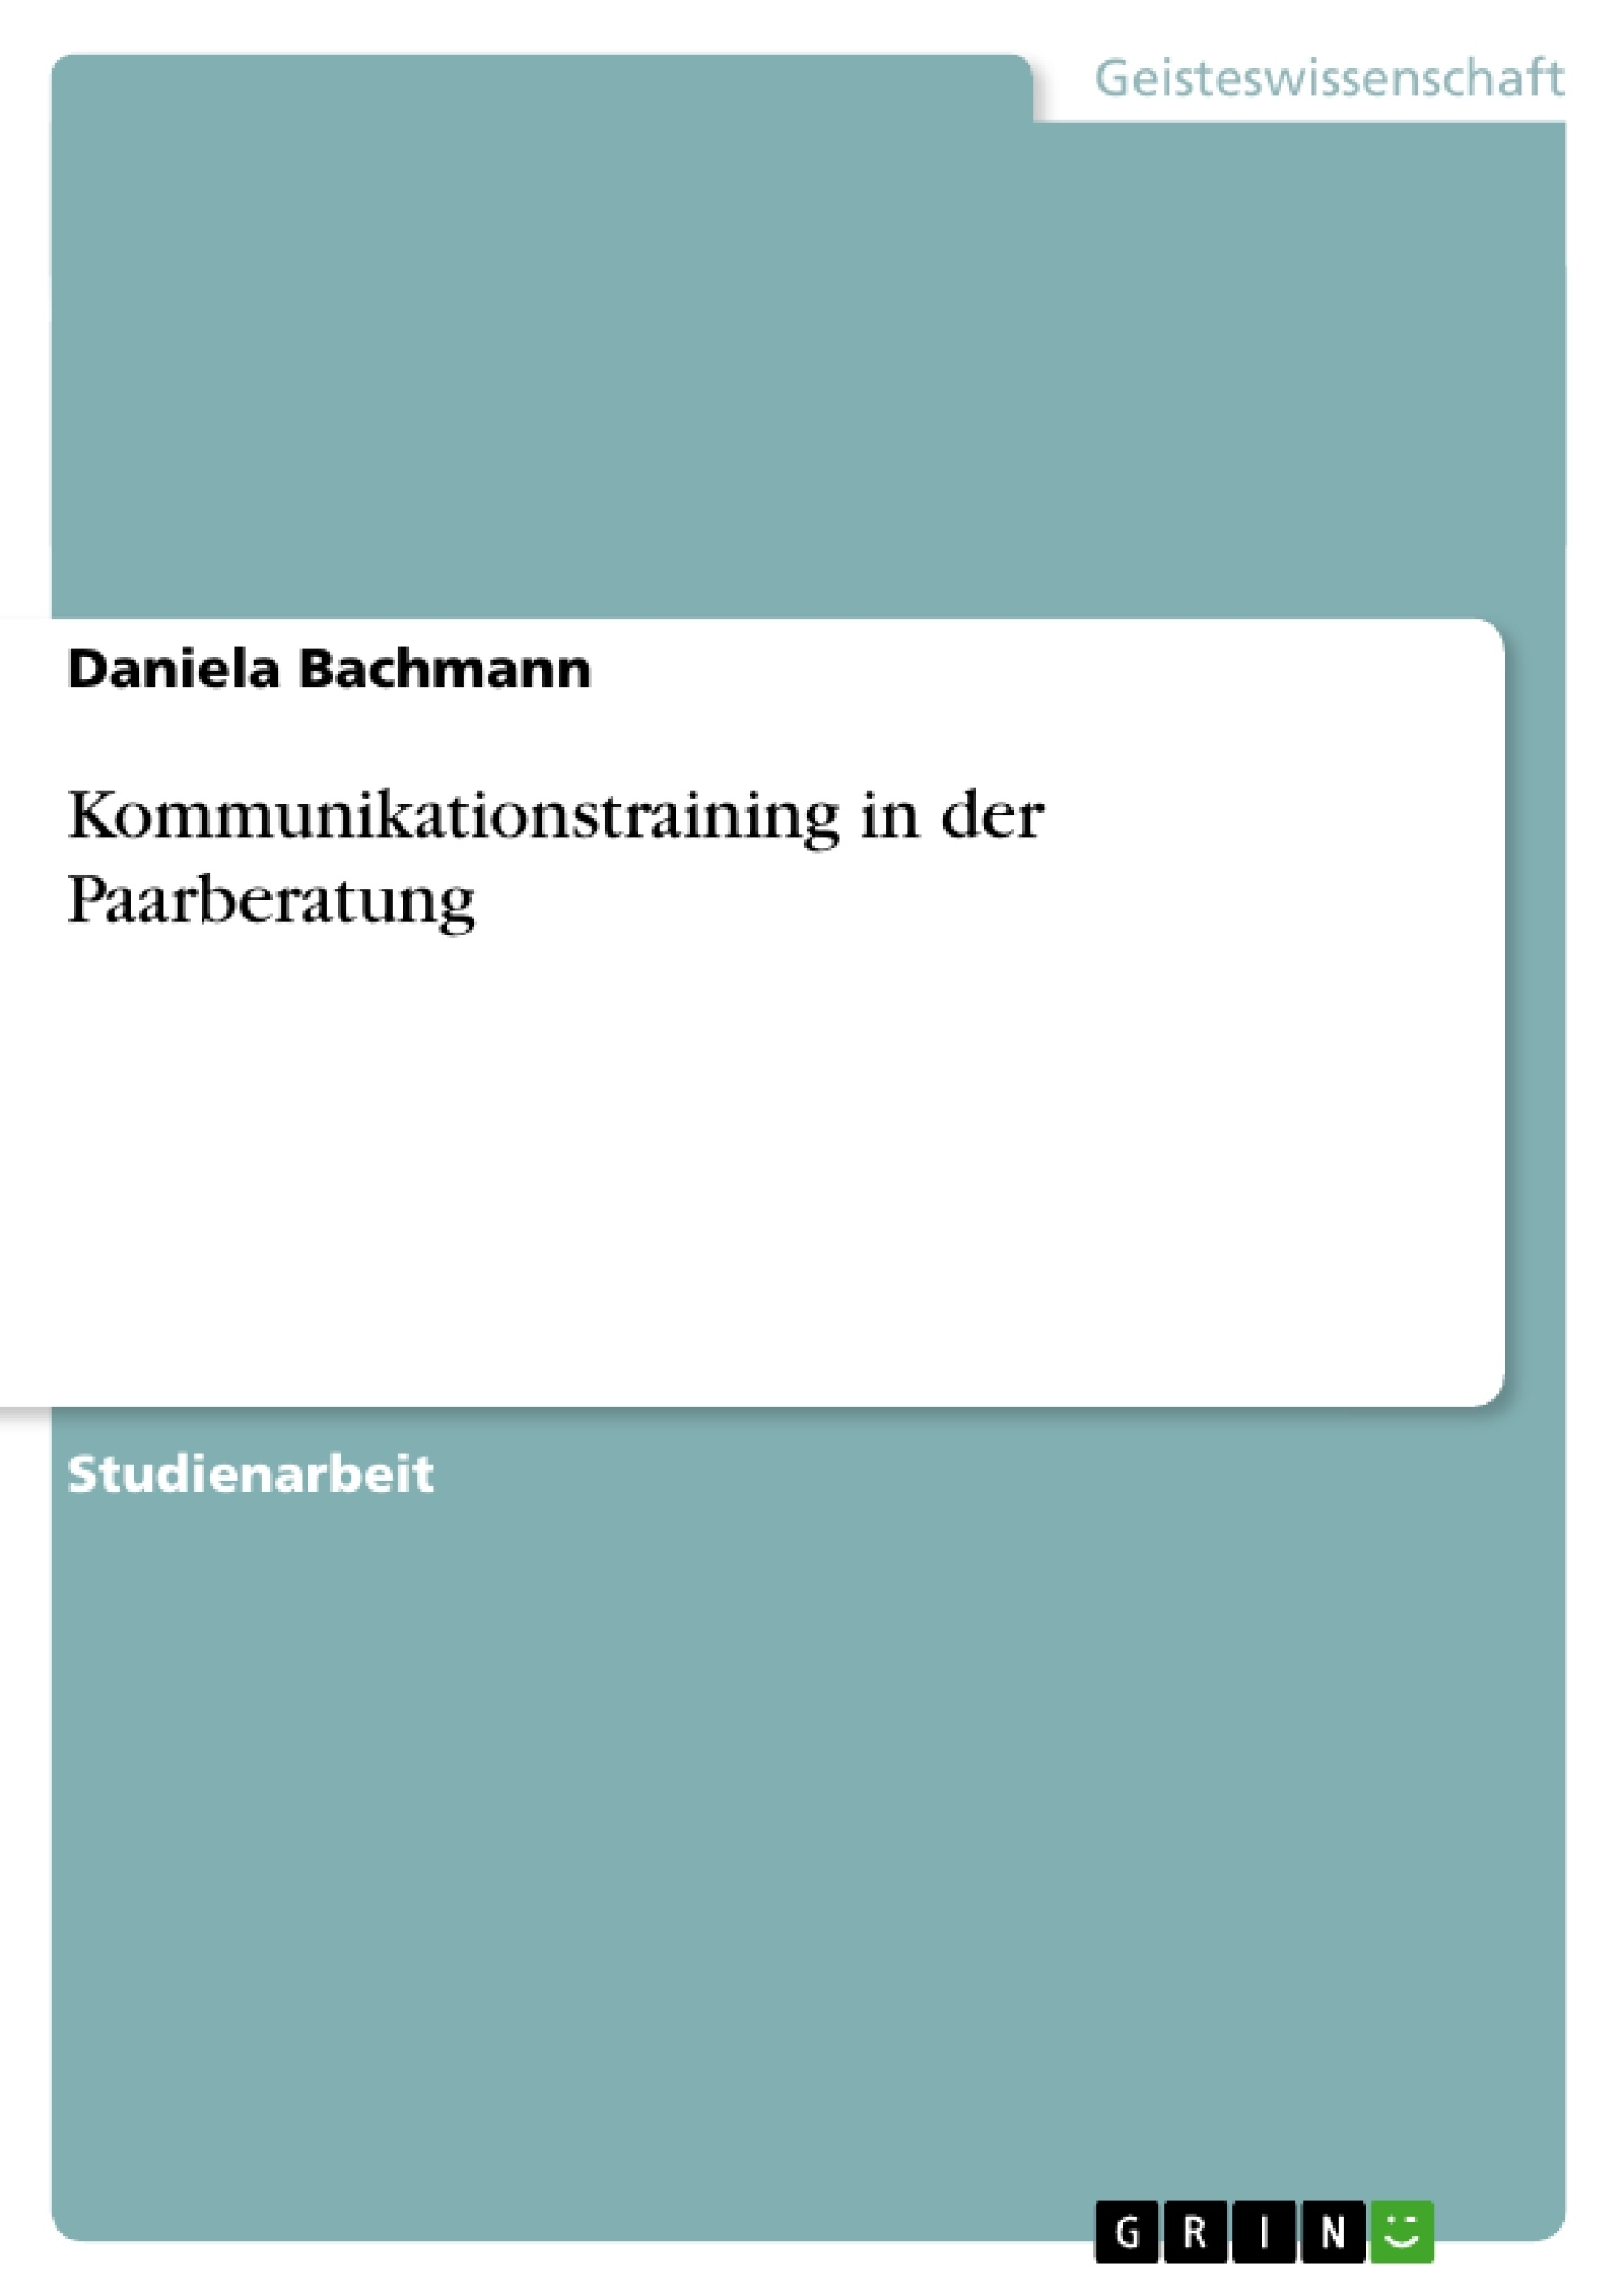 Titel: Kommunikationstraining in der Paarberatung